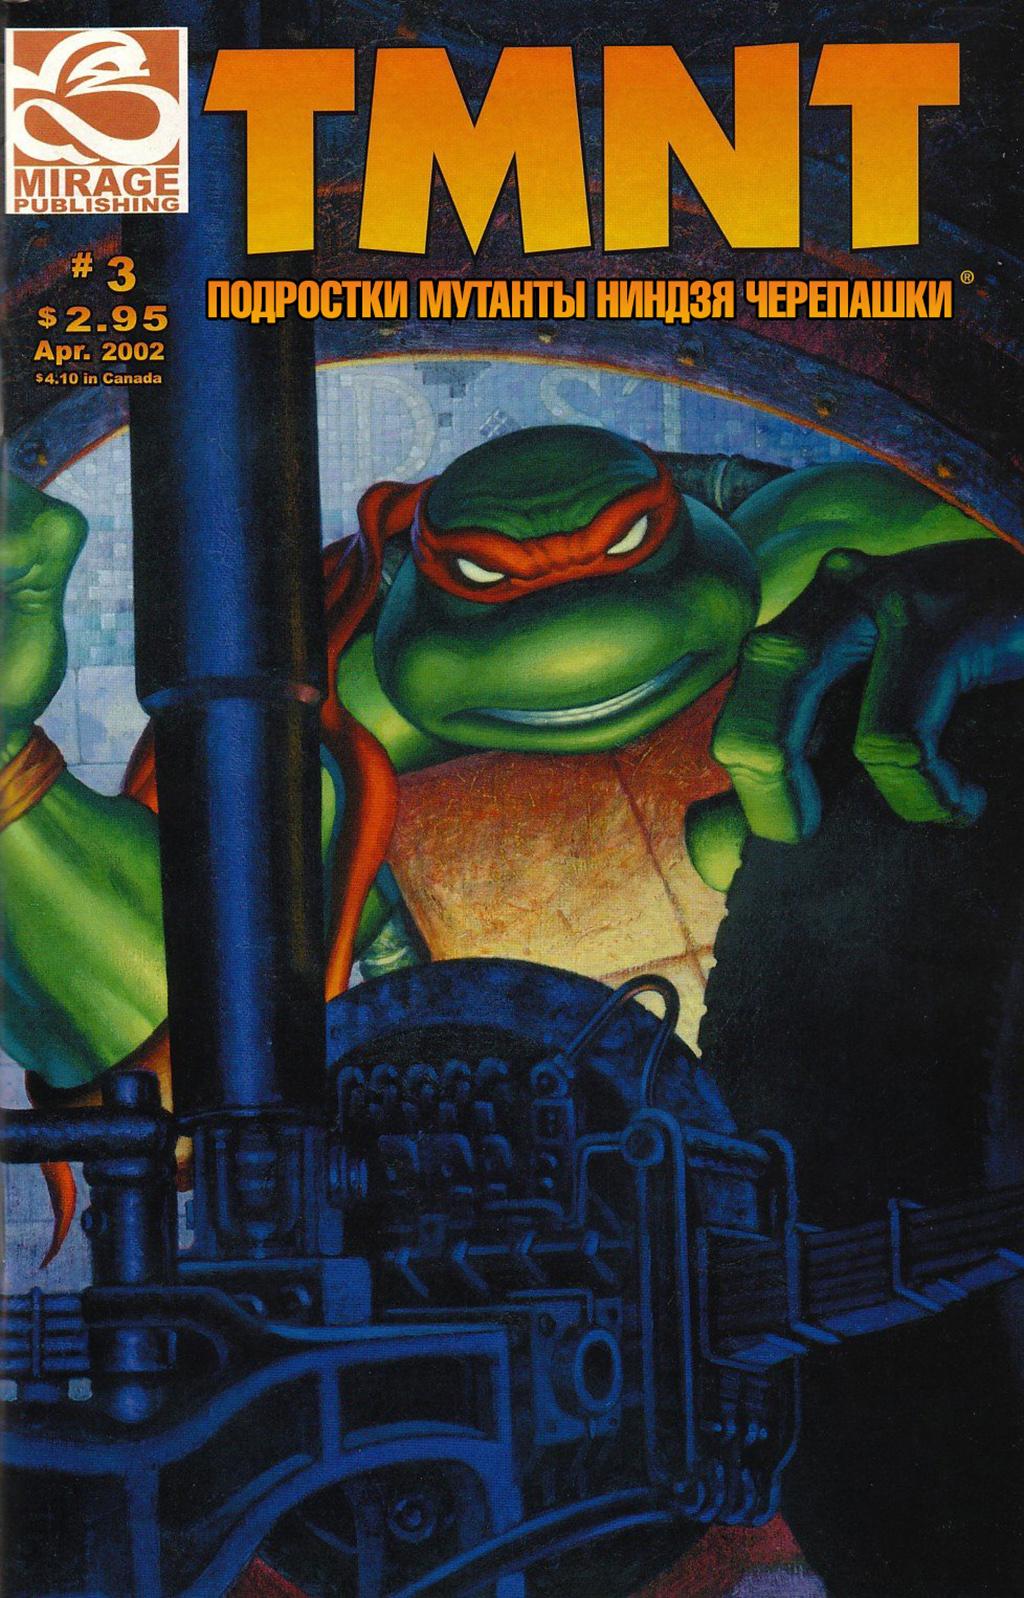 Комикс Подростки Мутанты Ниндзя Черепашки том 4